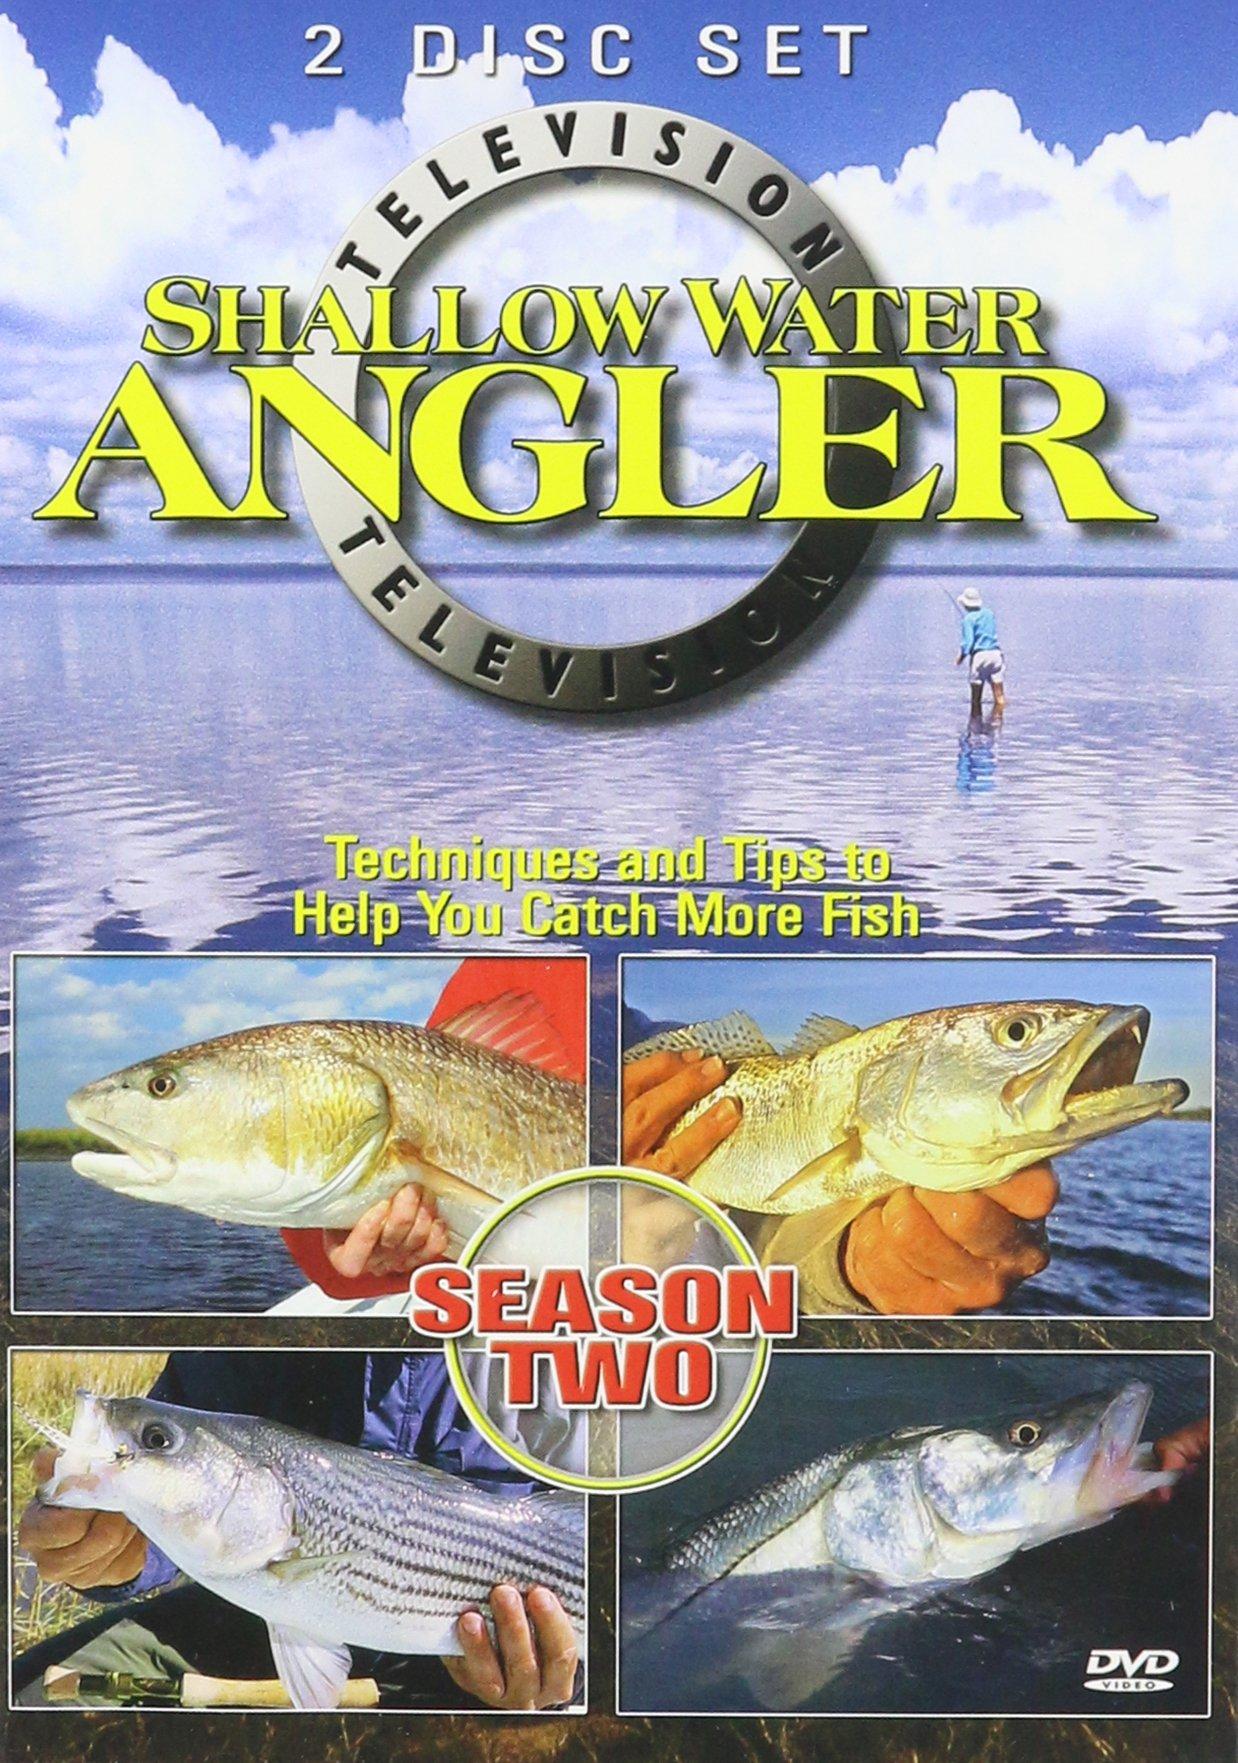 Shallow Water Angler TV Season 2 (2006) 2 DVD Set by Florida Sportsman